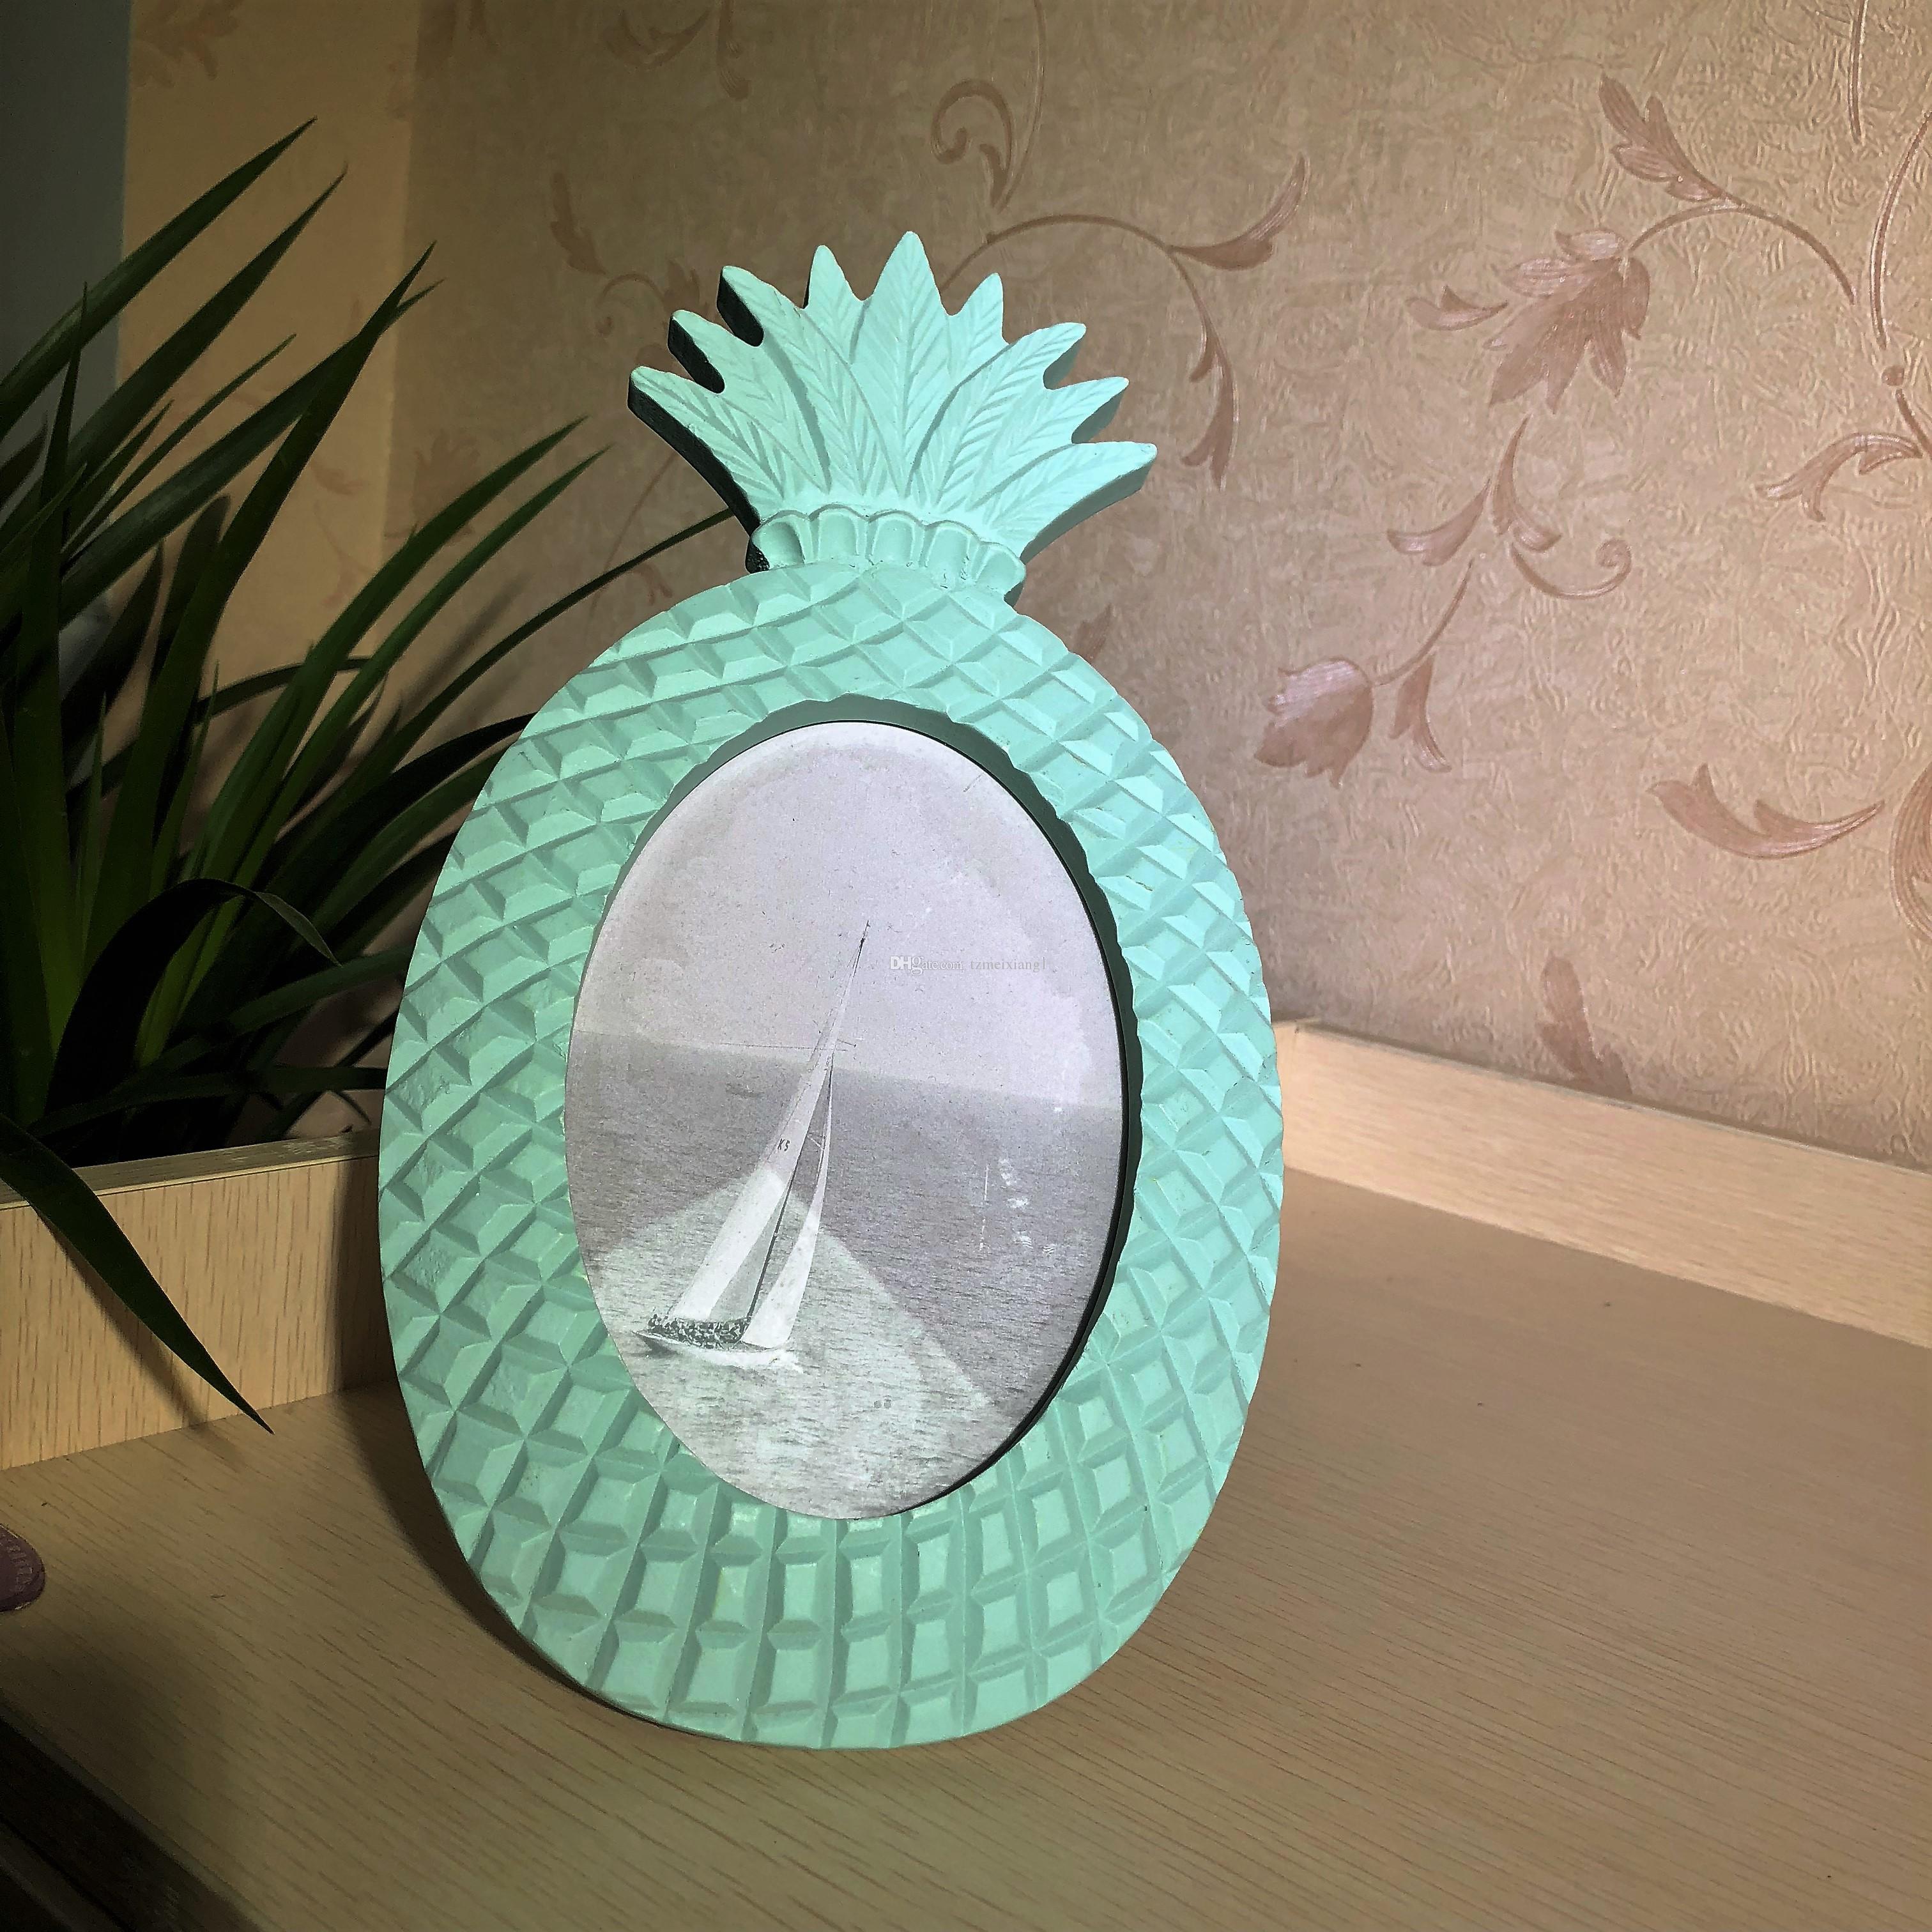 Blue Pineapple Shaped Wooden Photo Frame Nordic Style Retro Children Gift Wooden Frame Decoration Desktop Photo Frame